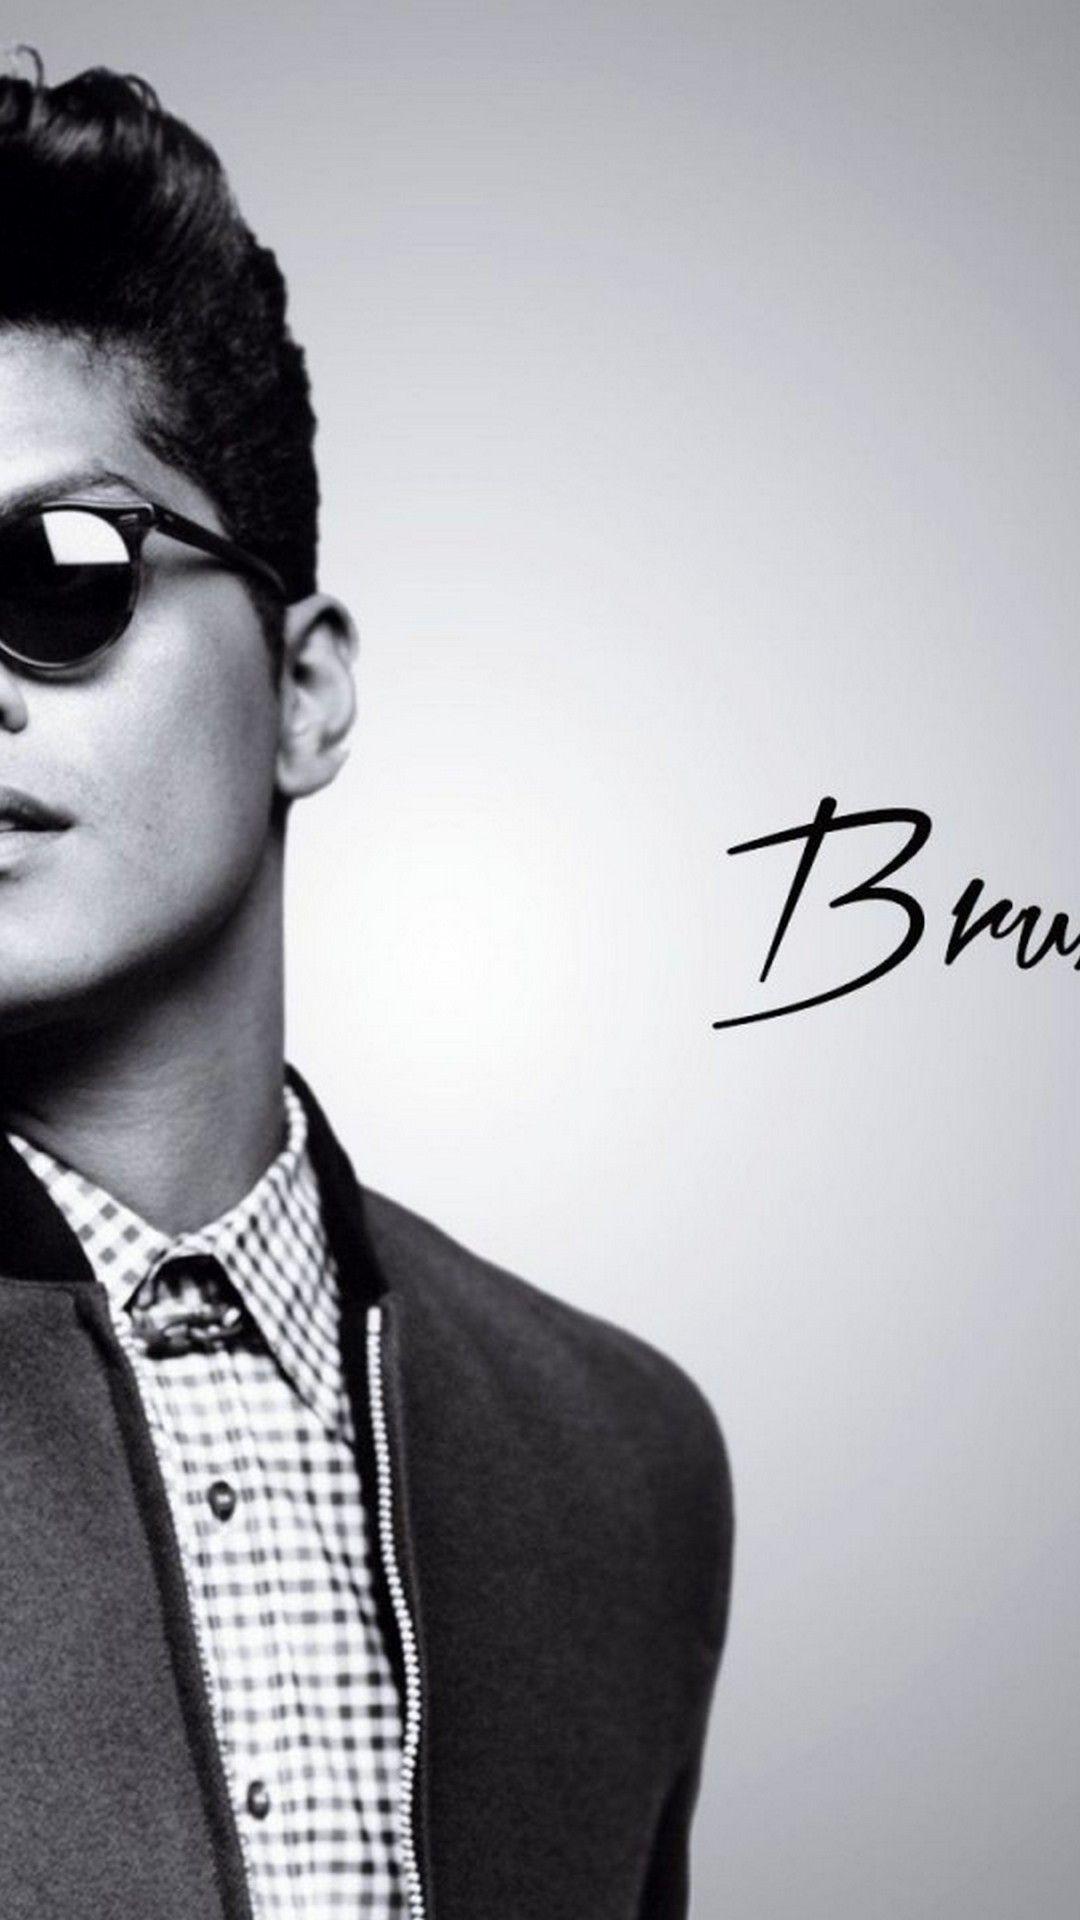 Bruno Mars Wallpaper For Iphone Best Iphone Wallpaper Mars Wallpaper Bruno Mars Bruno